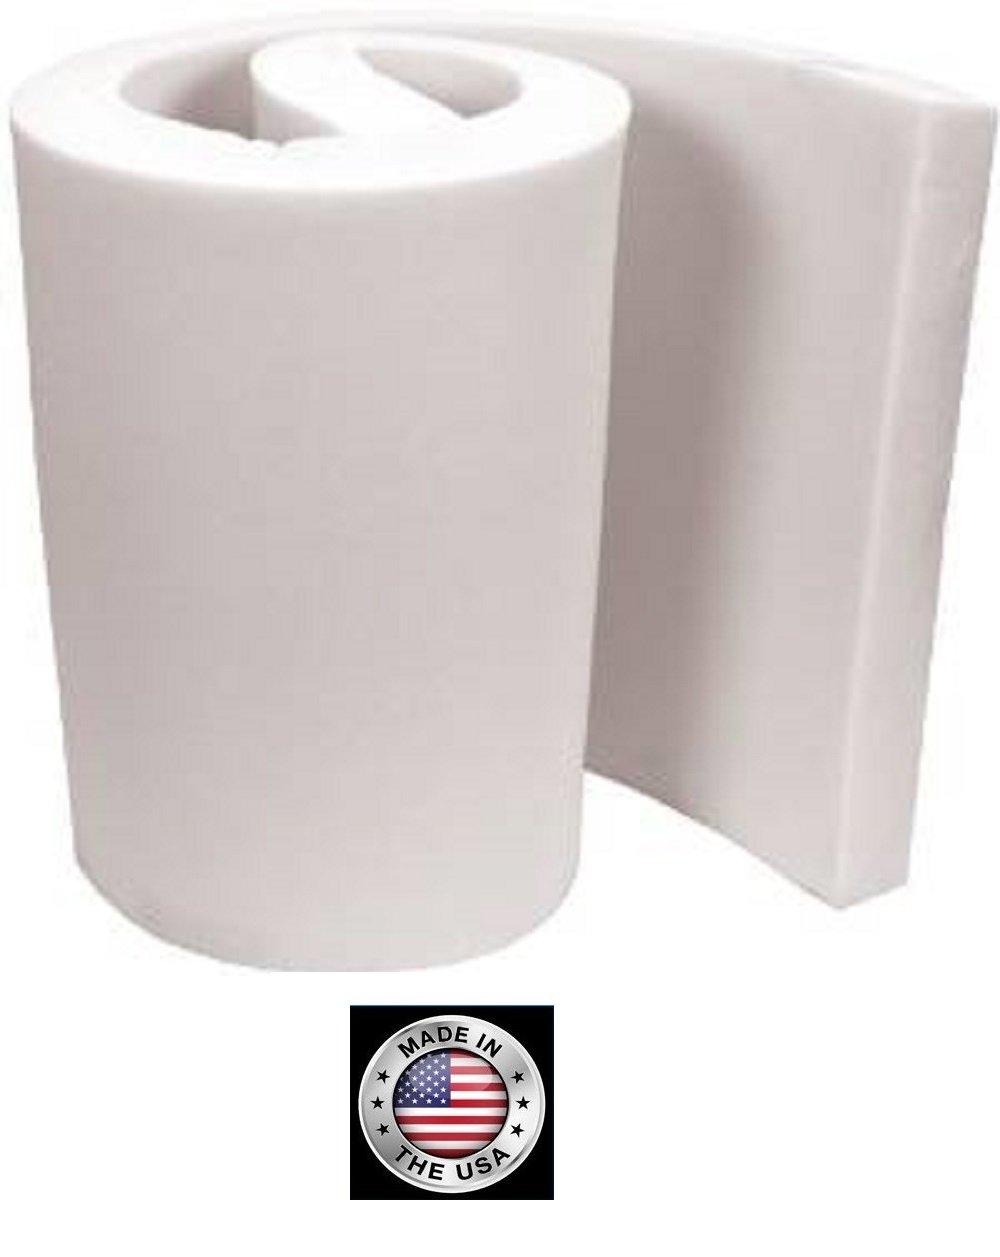 FoamTouch Upholstery Foam Cushion, 3'' L x 30'' W x 72'' H, Medium Density